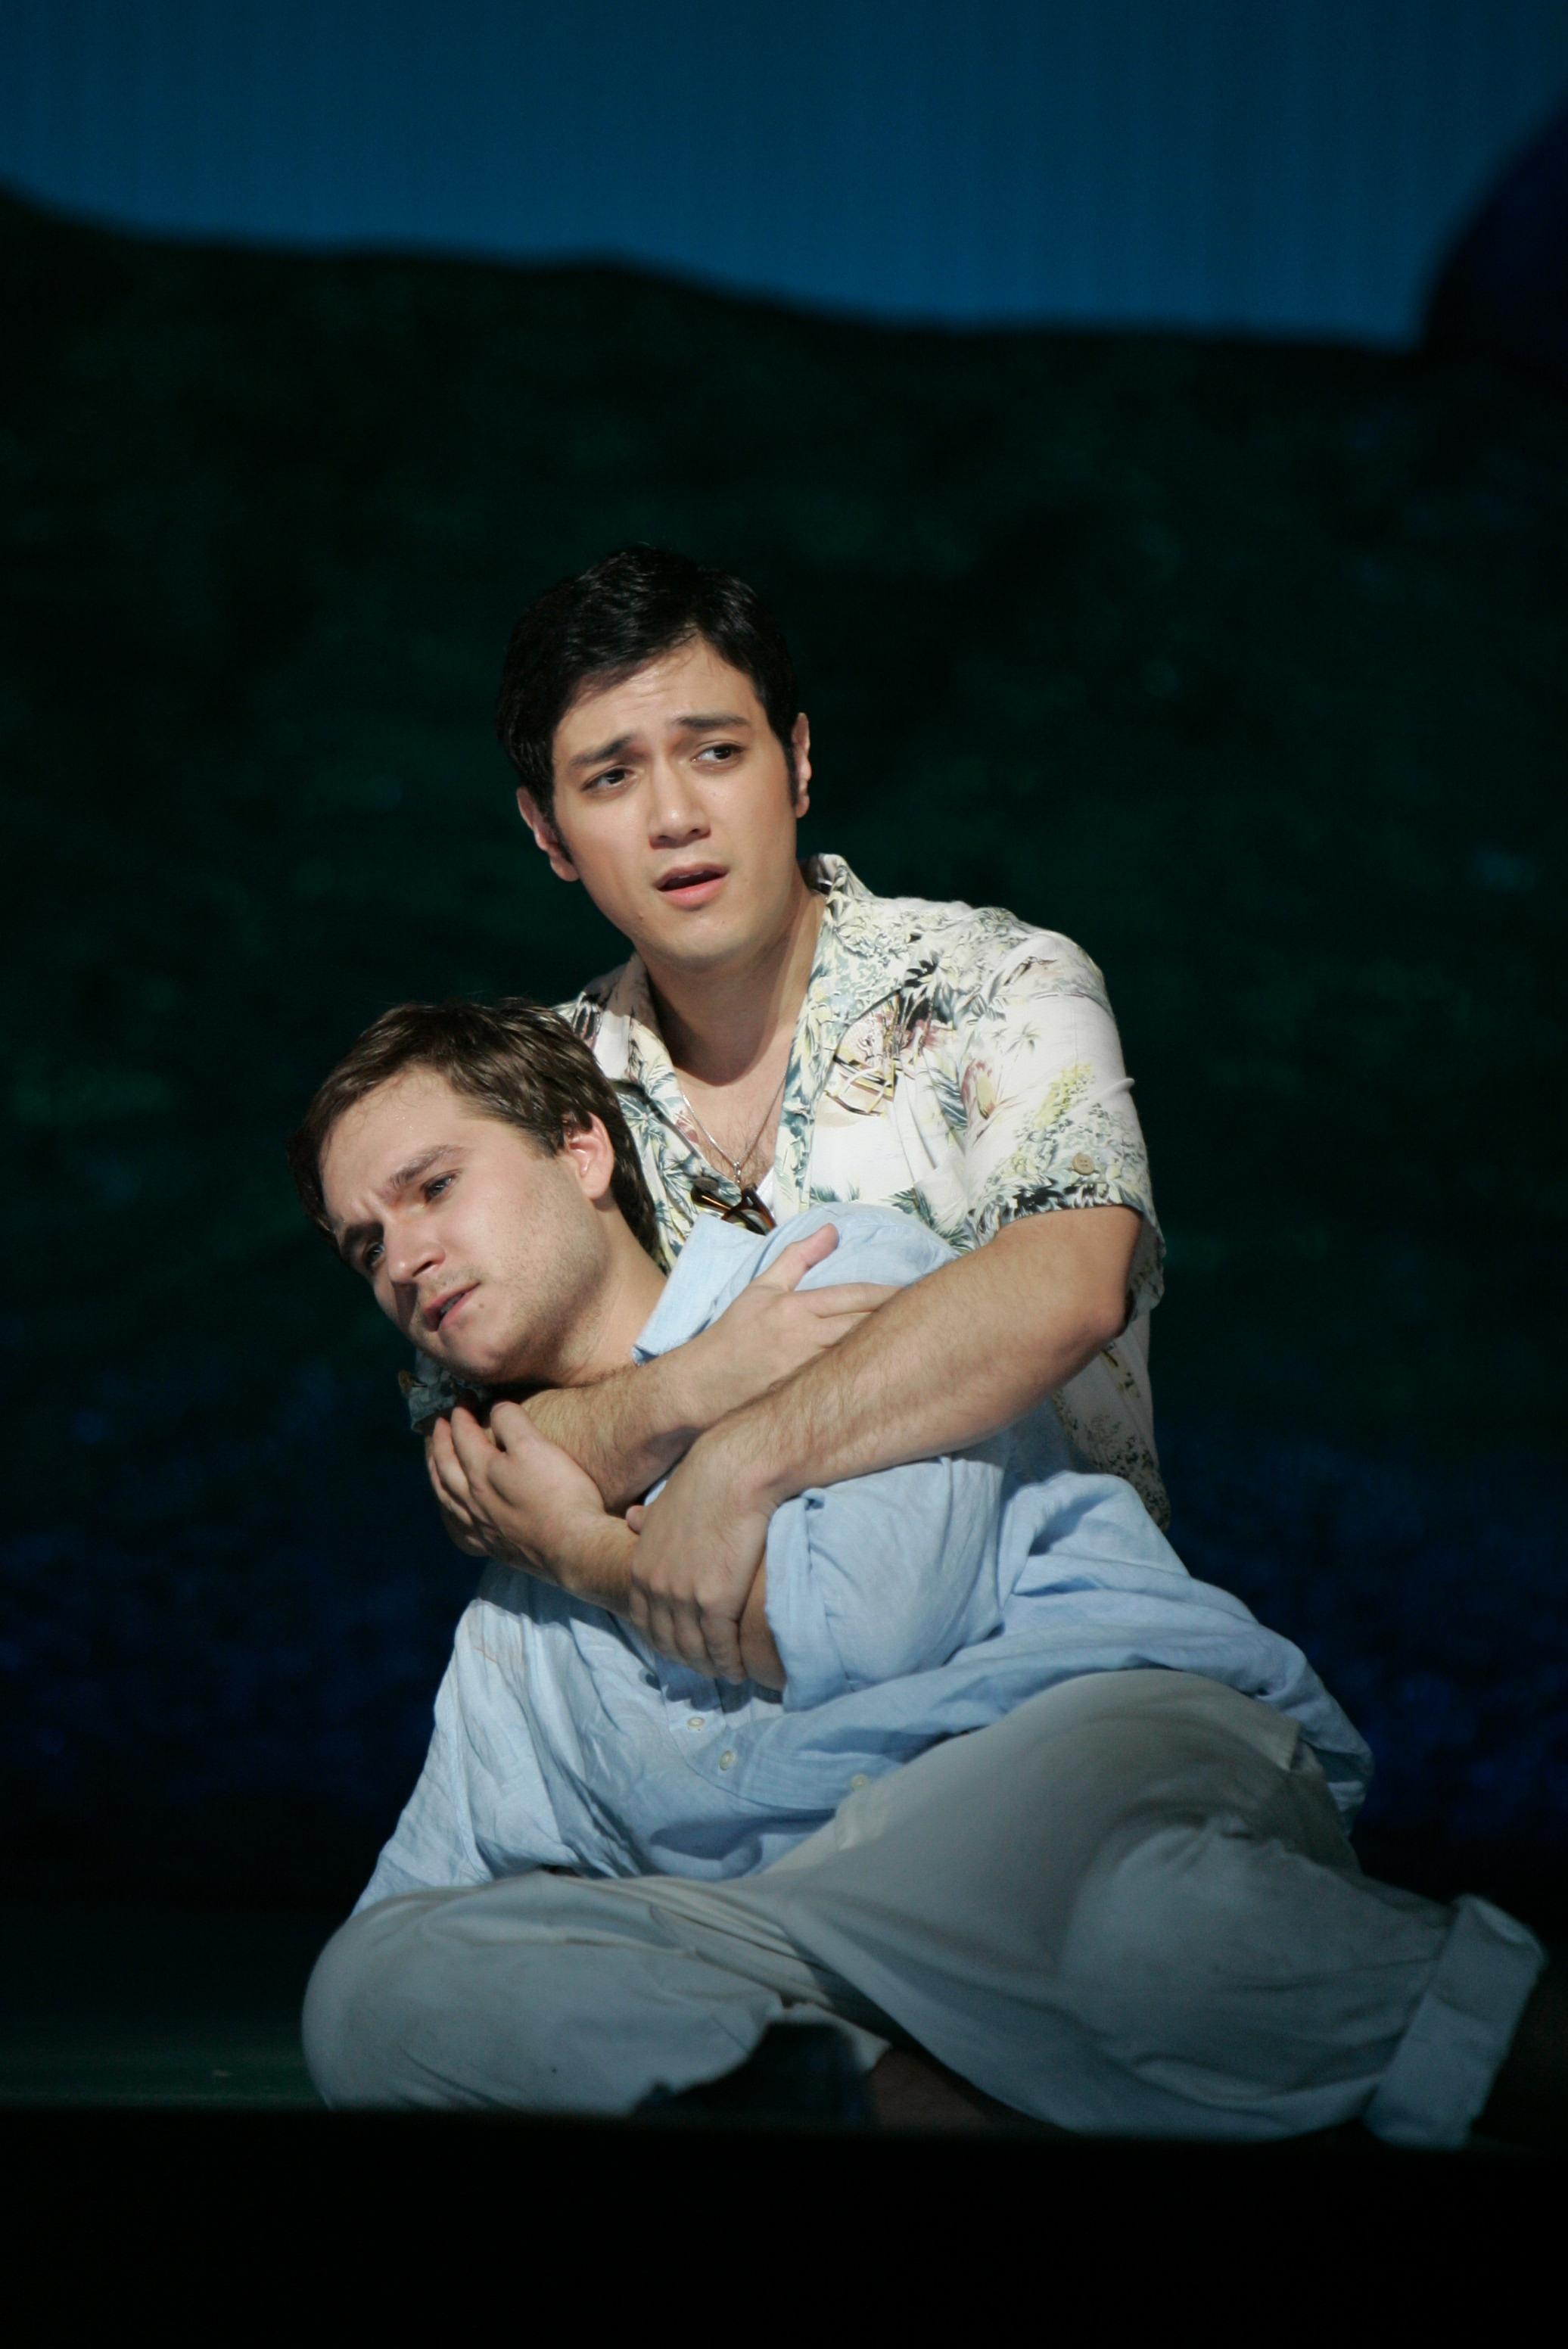 Damon in Acis and Galatea (Handel) at New York City Opera with Philippe Castagner, tenor (Photo credit: Carol Rosegg)